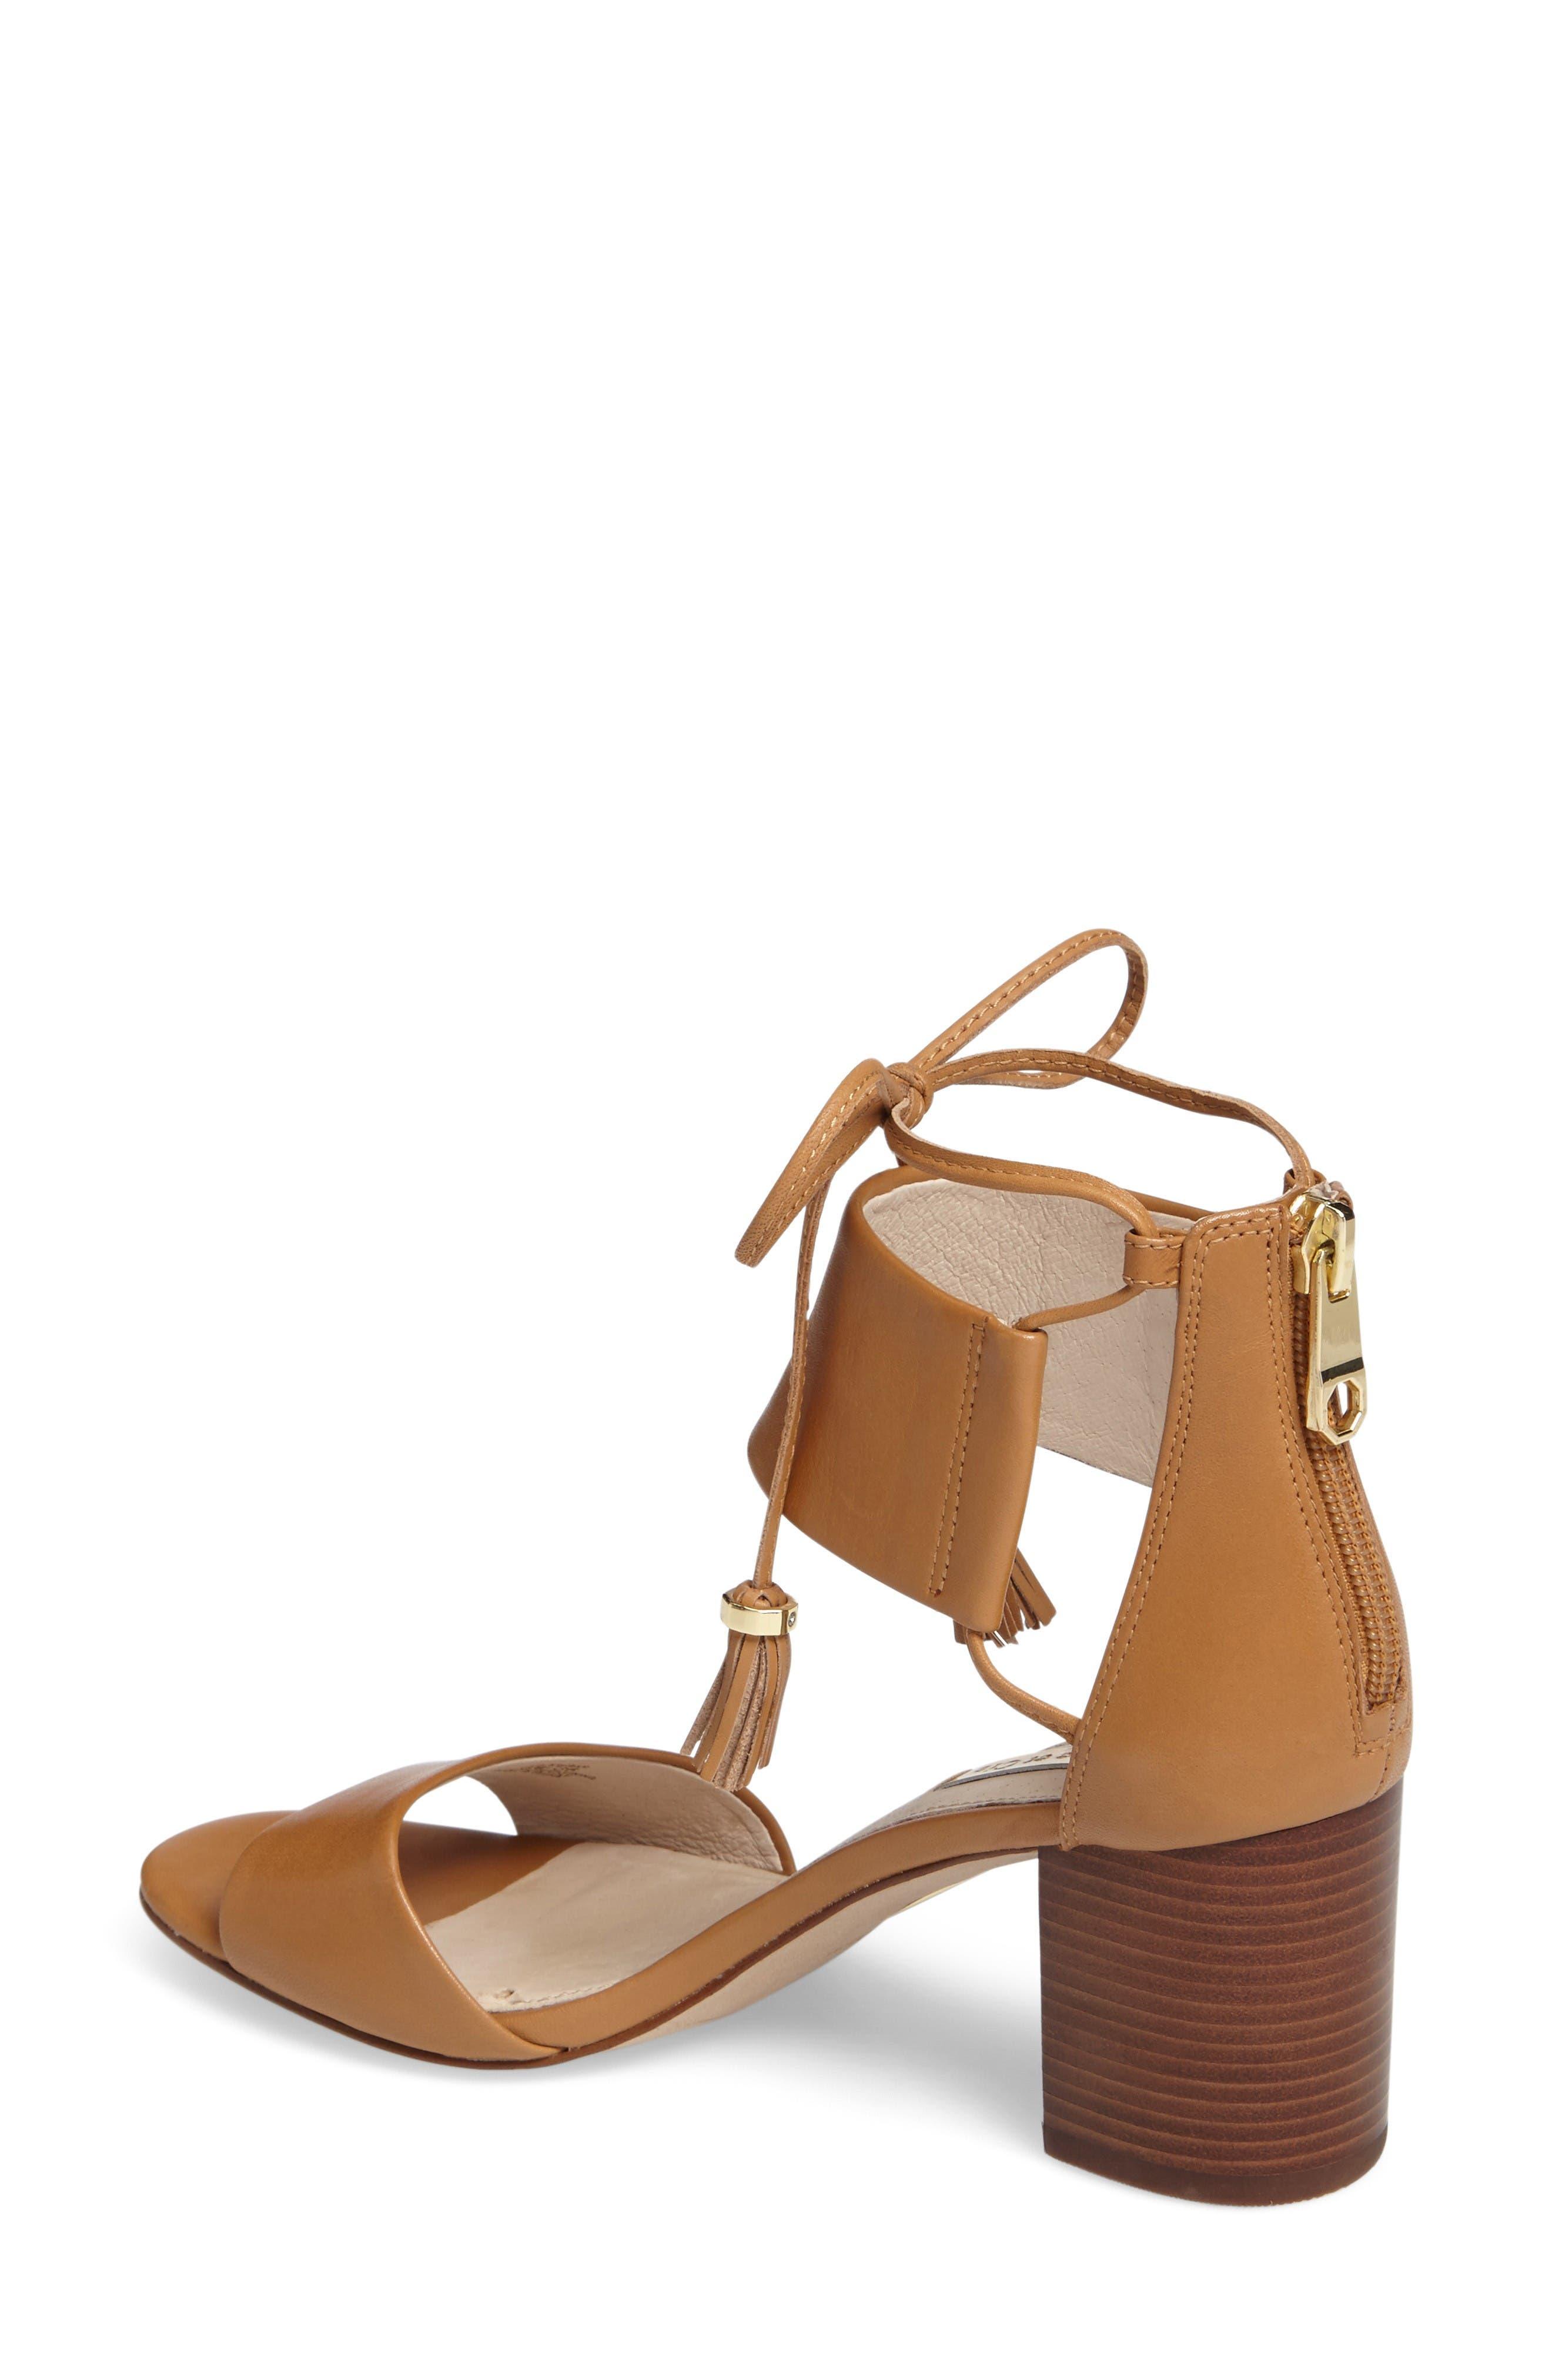 Keegan Block Heel Sandal,                             Alternate thumbnail 2, color,                             True Tan Leather